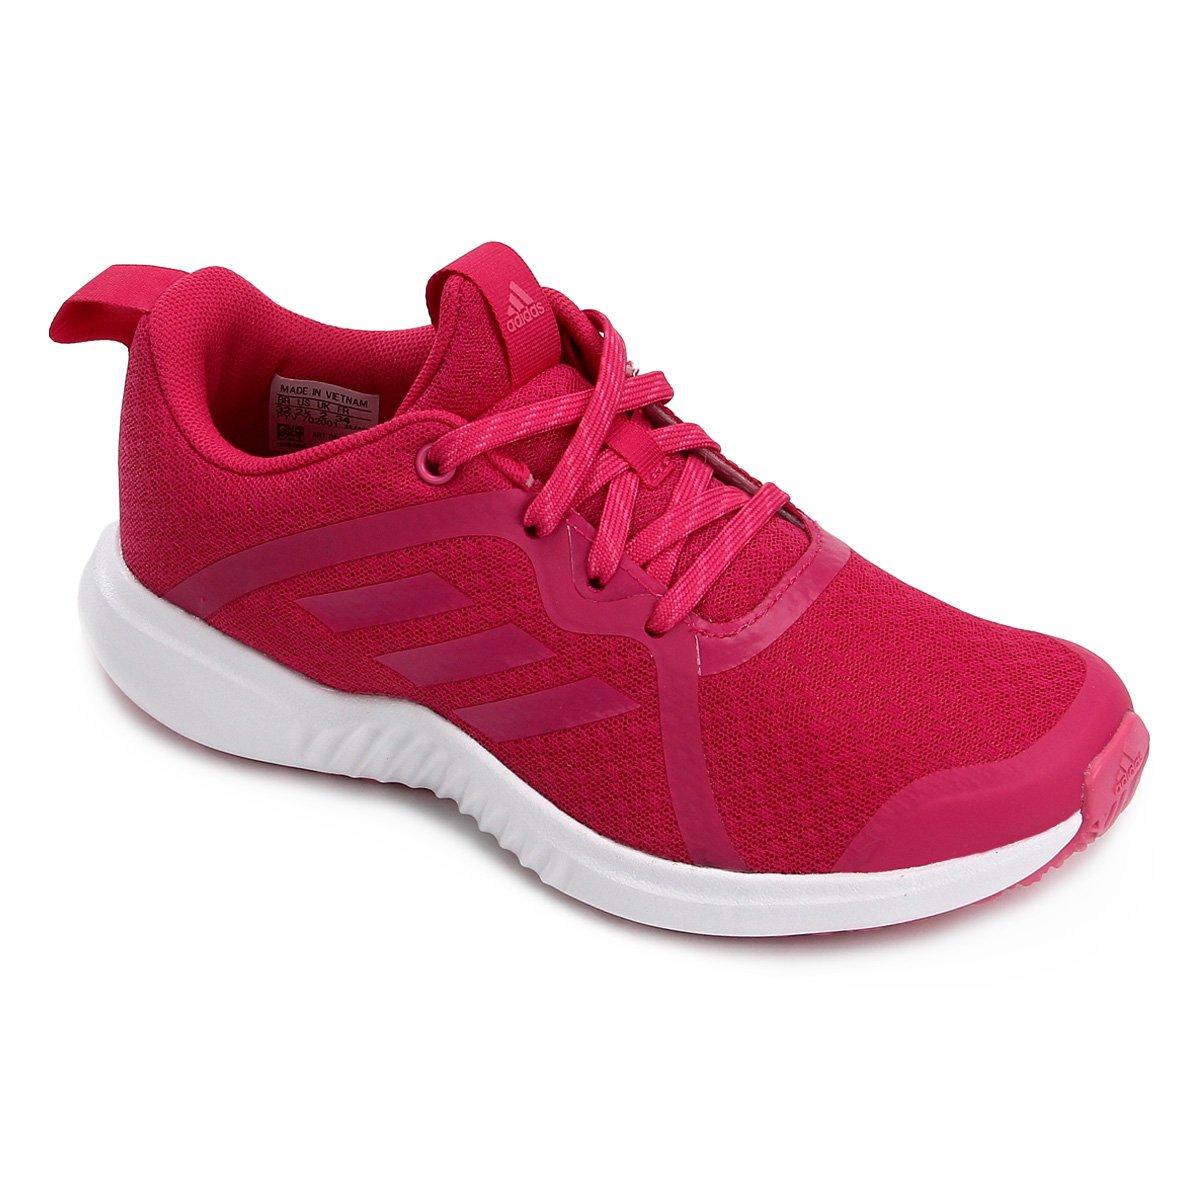 52493cb5397da FornecedorNetshoes. Tênis Infantil Adidas Fortarun X K